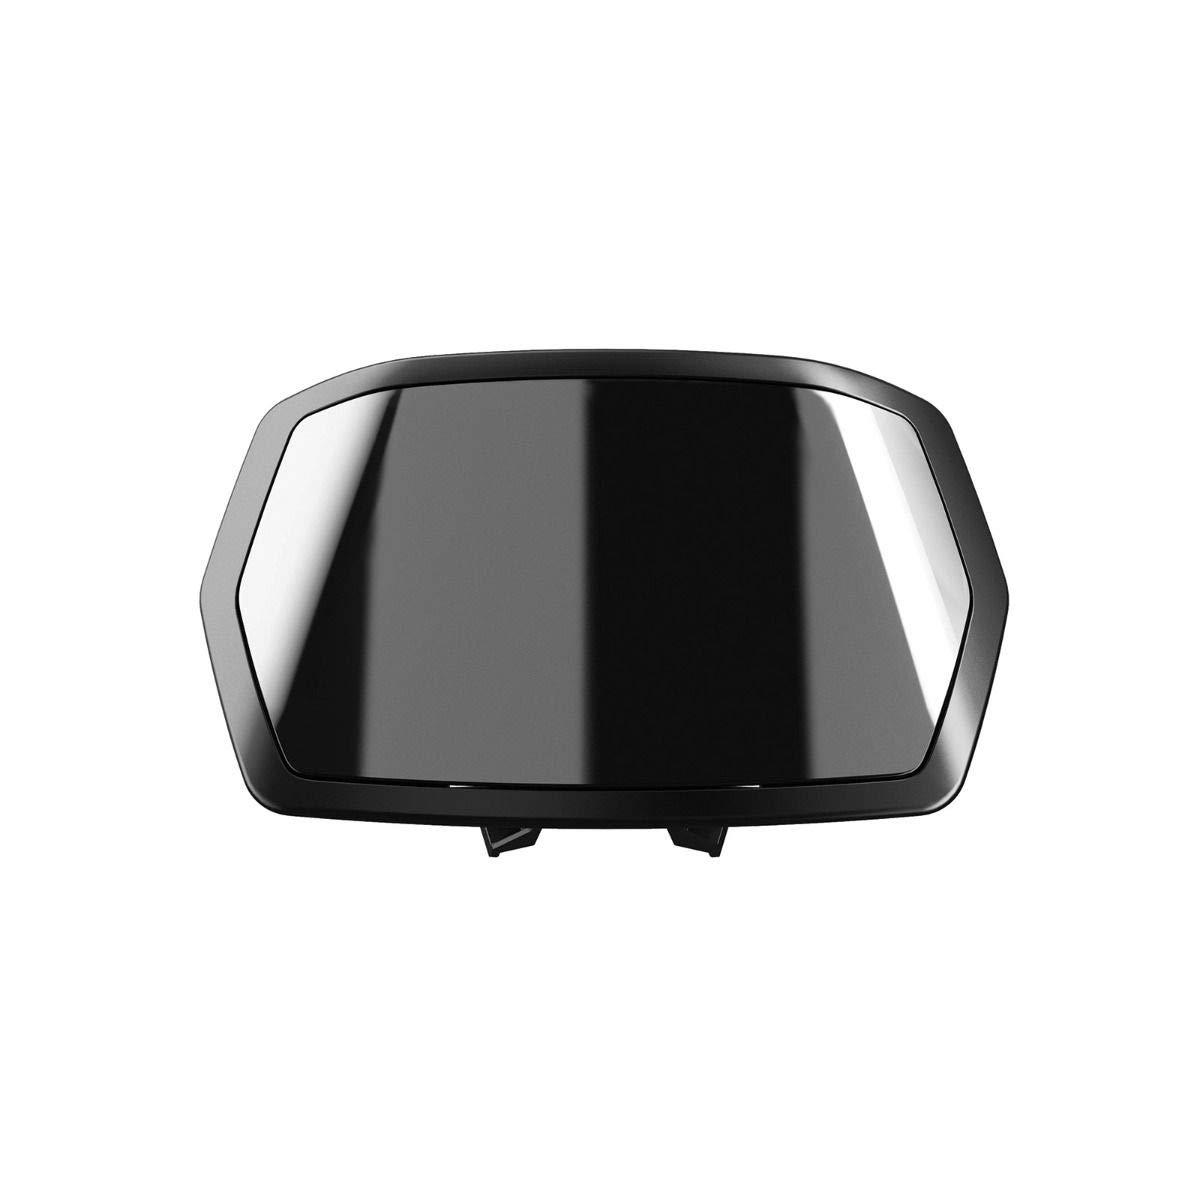 NEW OEM CAN-AM RYKER GAUGE SPOILER KIT - BLACK - FITS ALL MODELS - 219400818